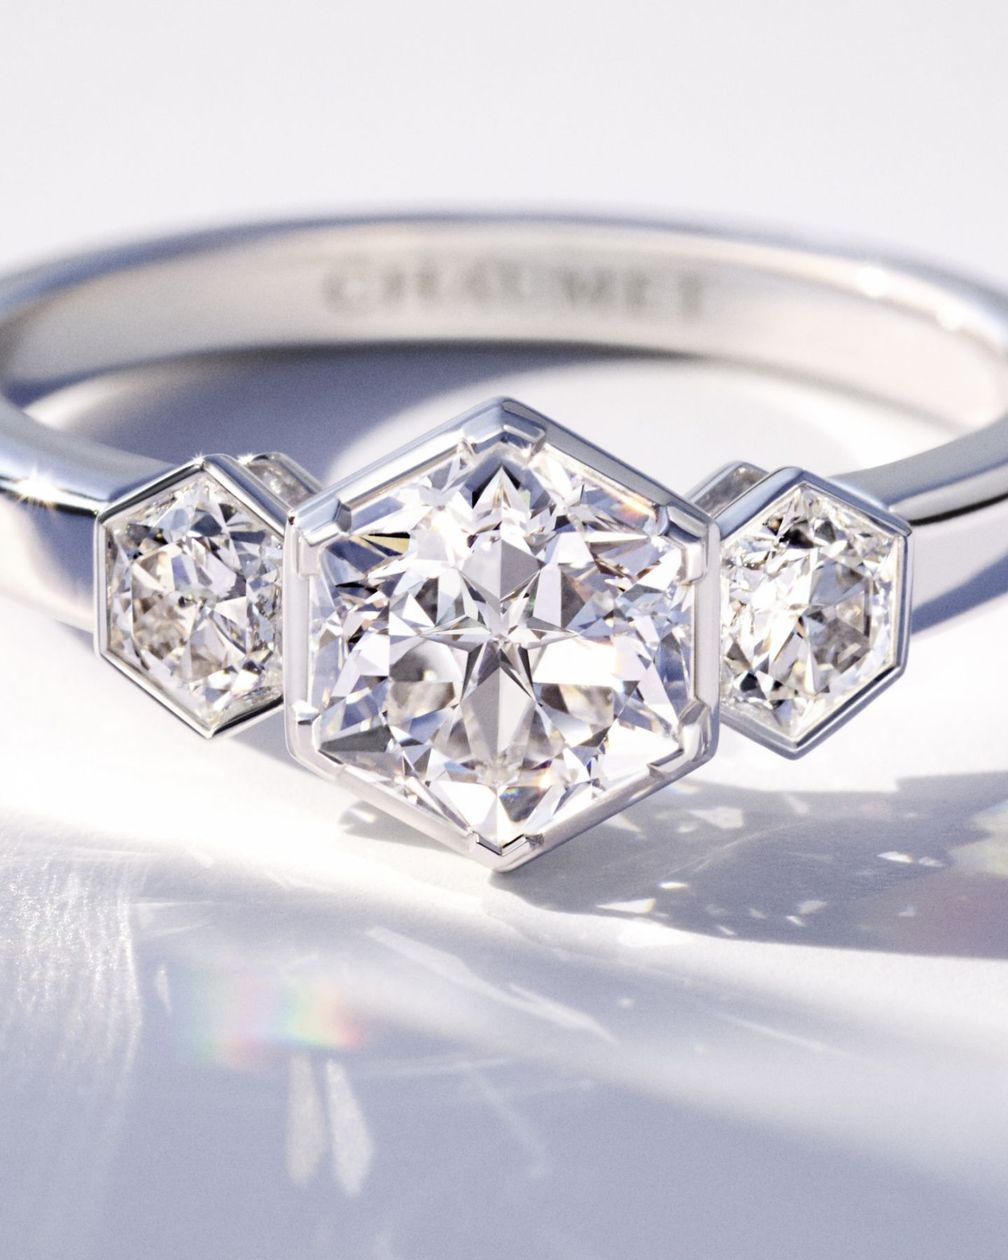 Кольцо-солитер Bee My Love от Chaumet из белого золота, украшенное бриллиантами огранки Taille Impératrice